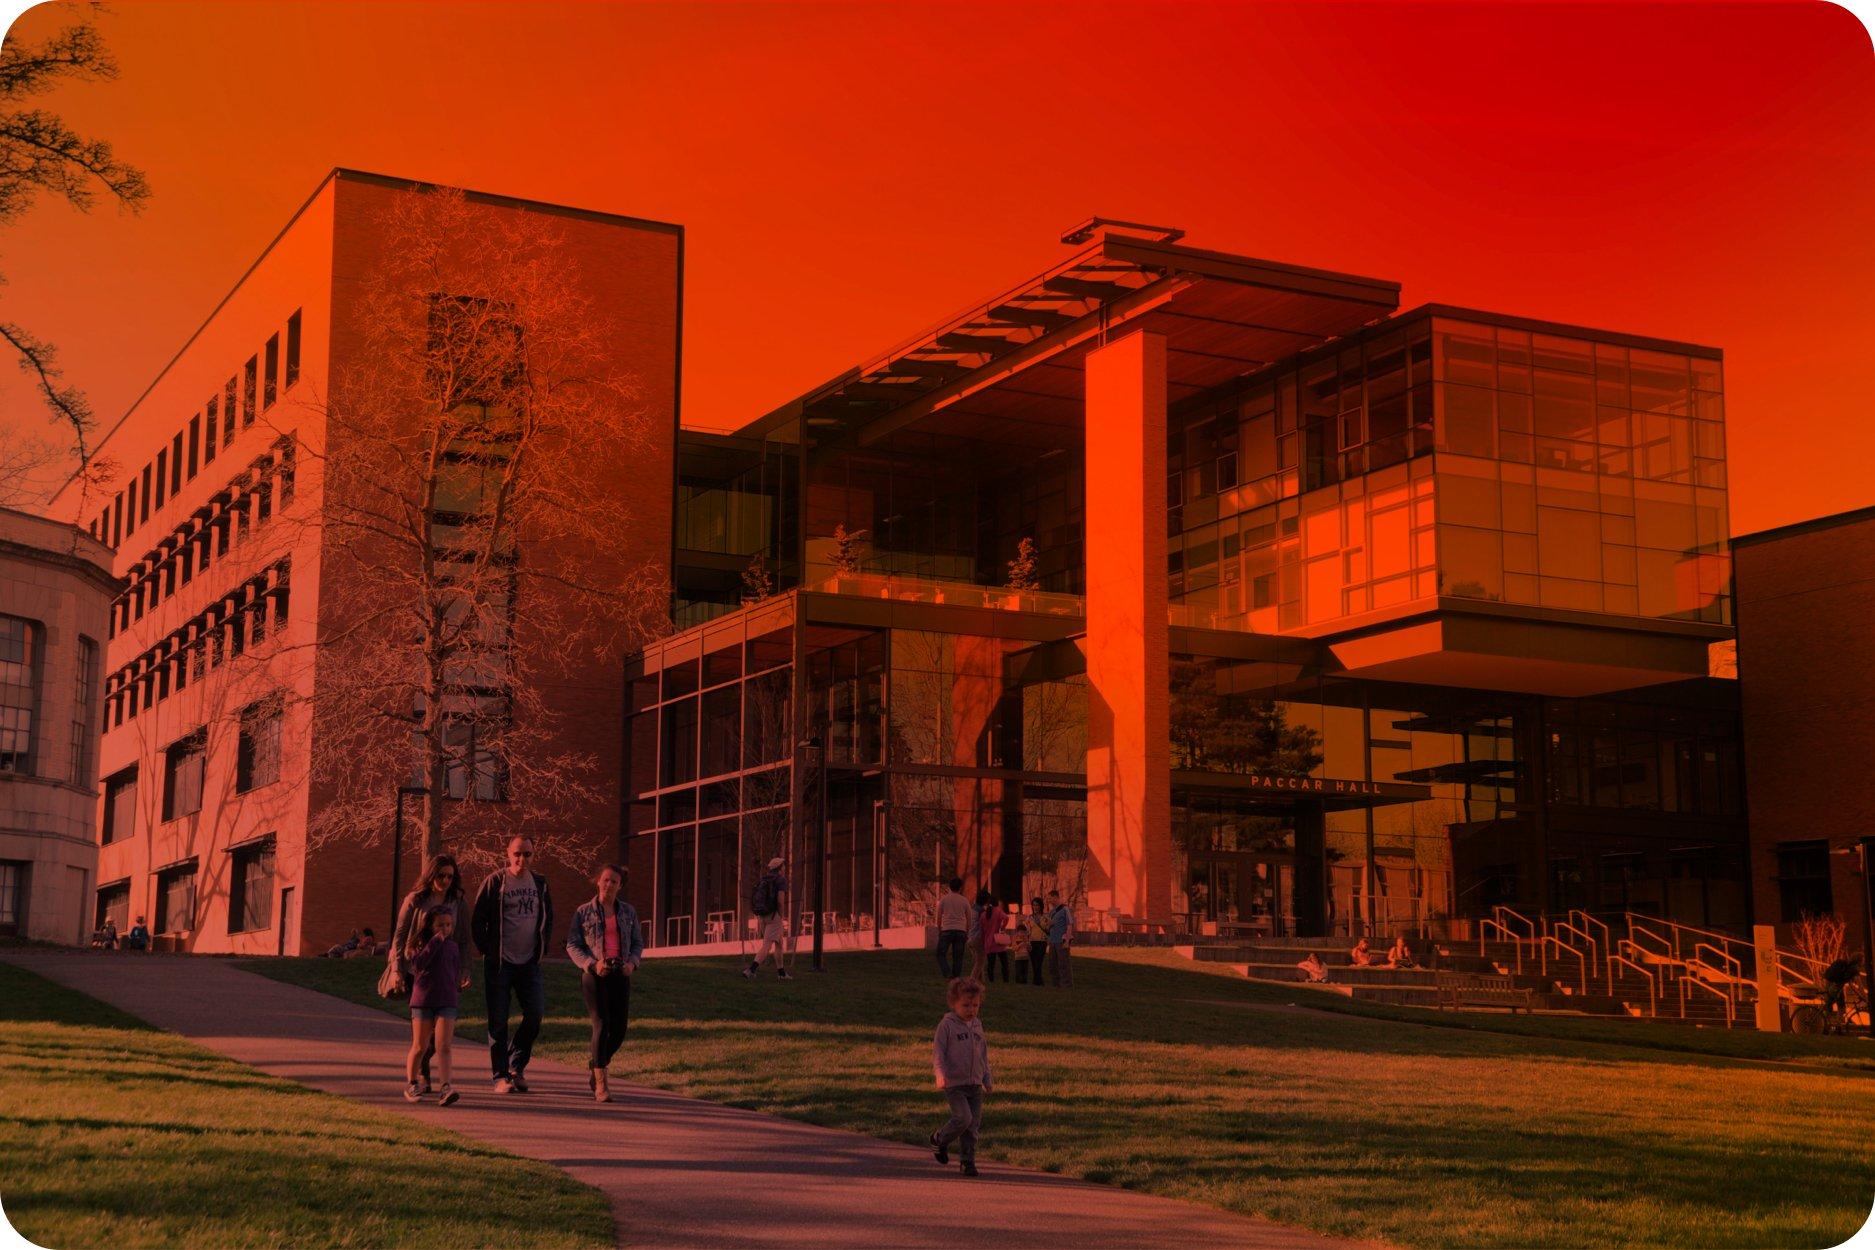 6 original ways to revamp your campus ambassador program